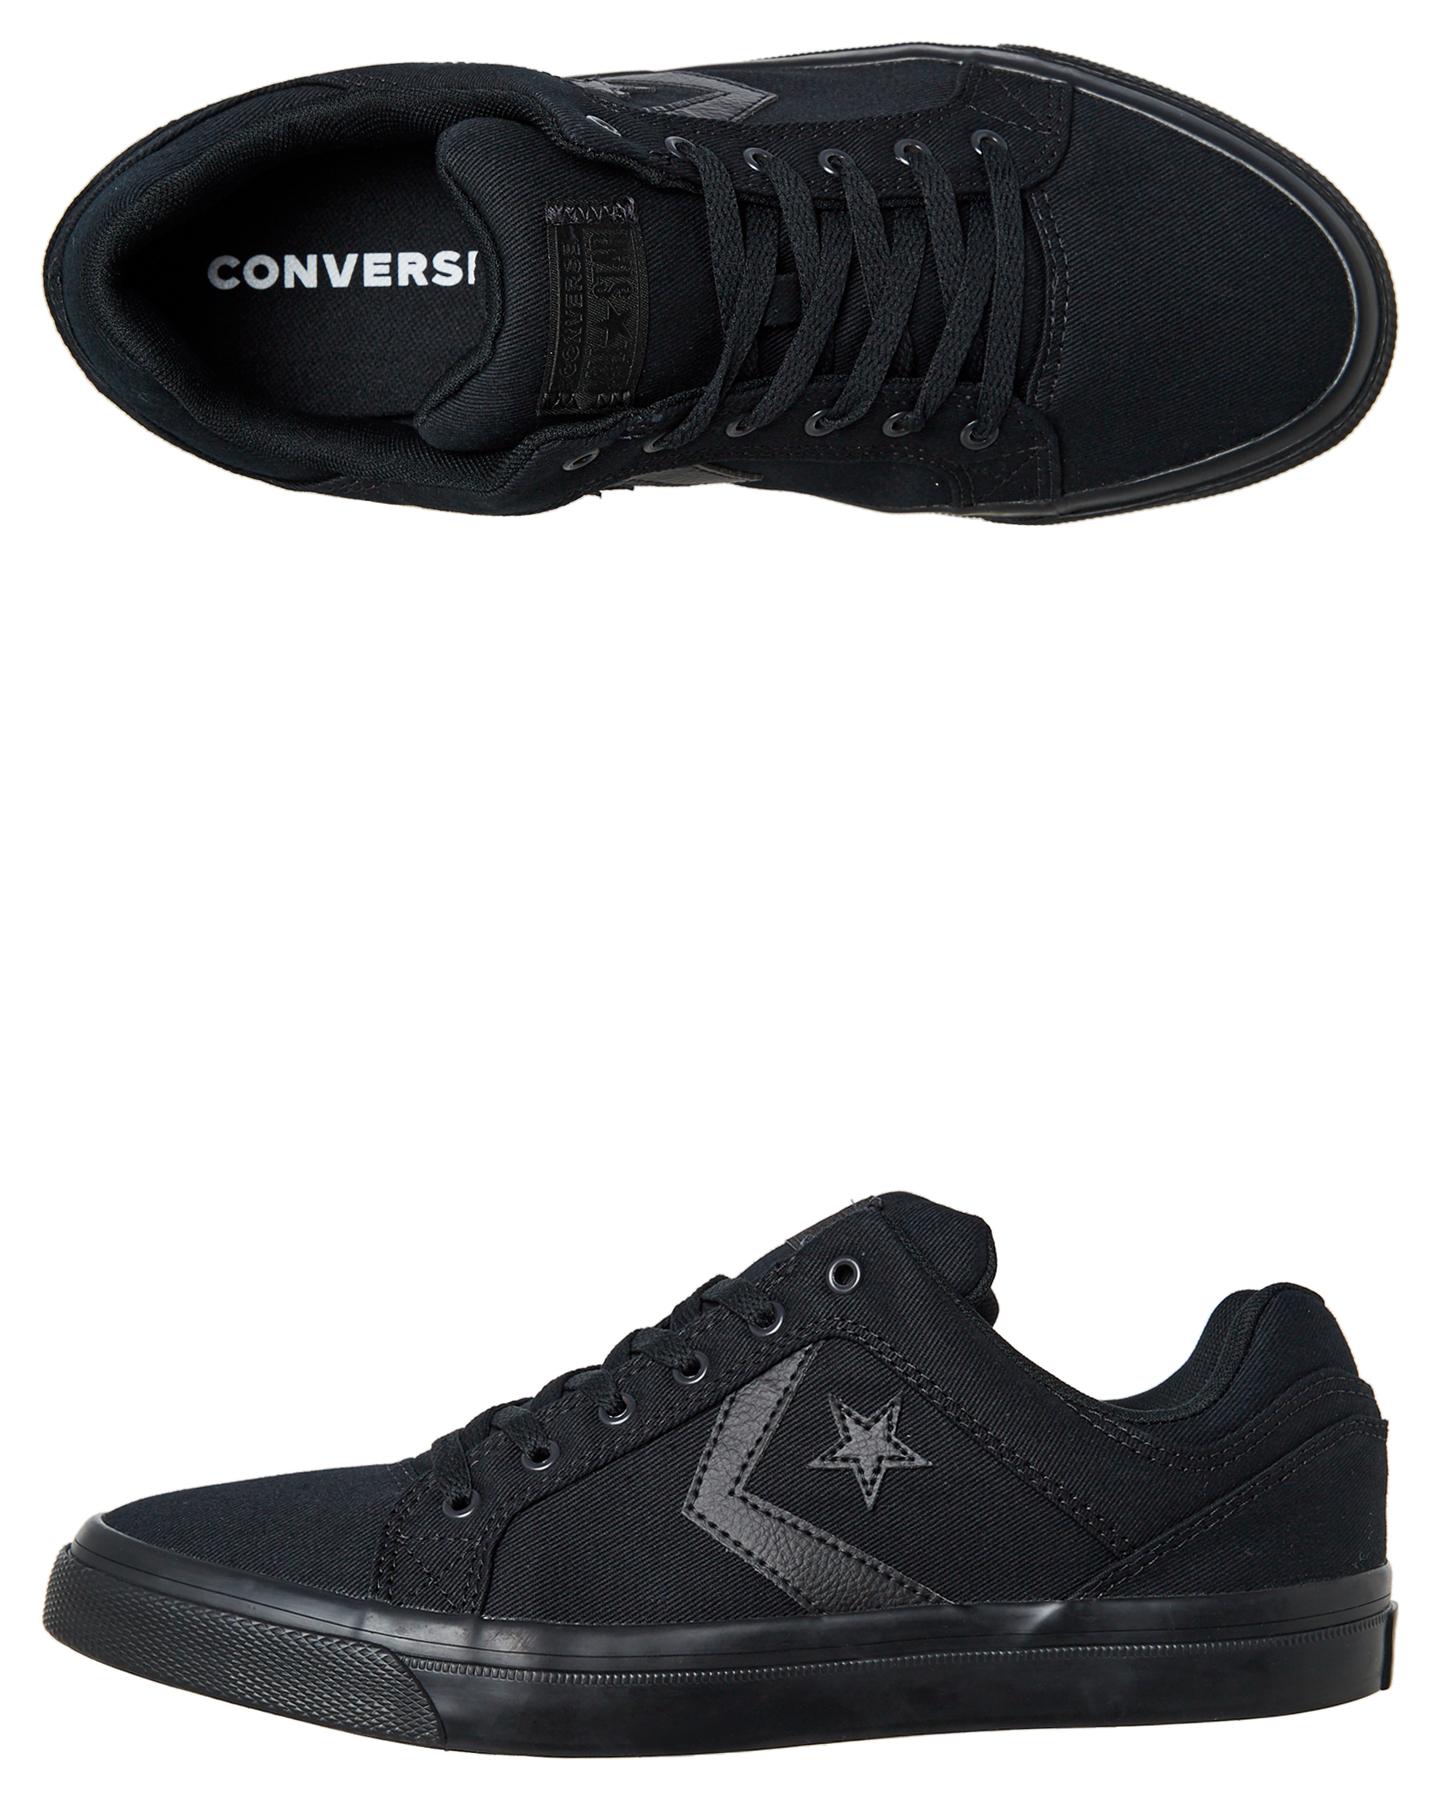 3adcf0ac2cdf Converse Distrito Bts Shoe - Black Black